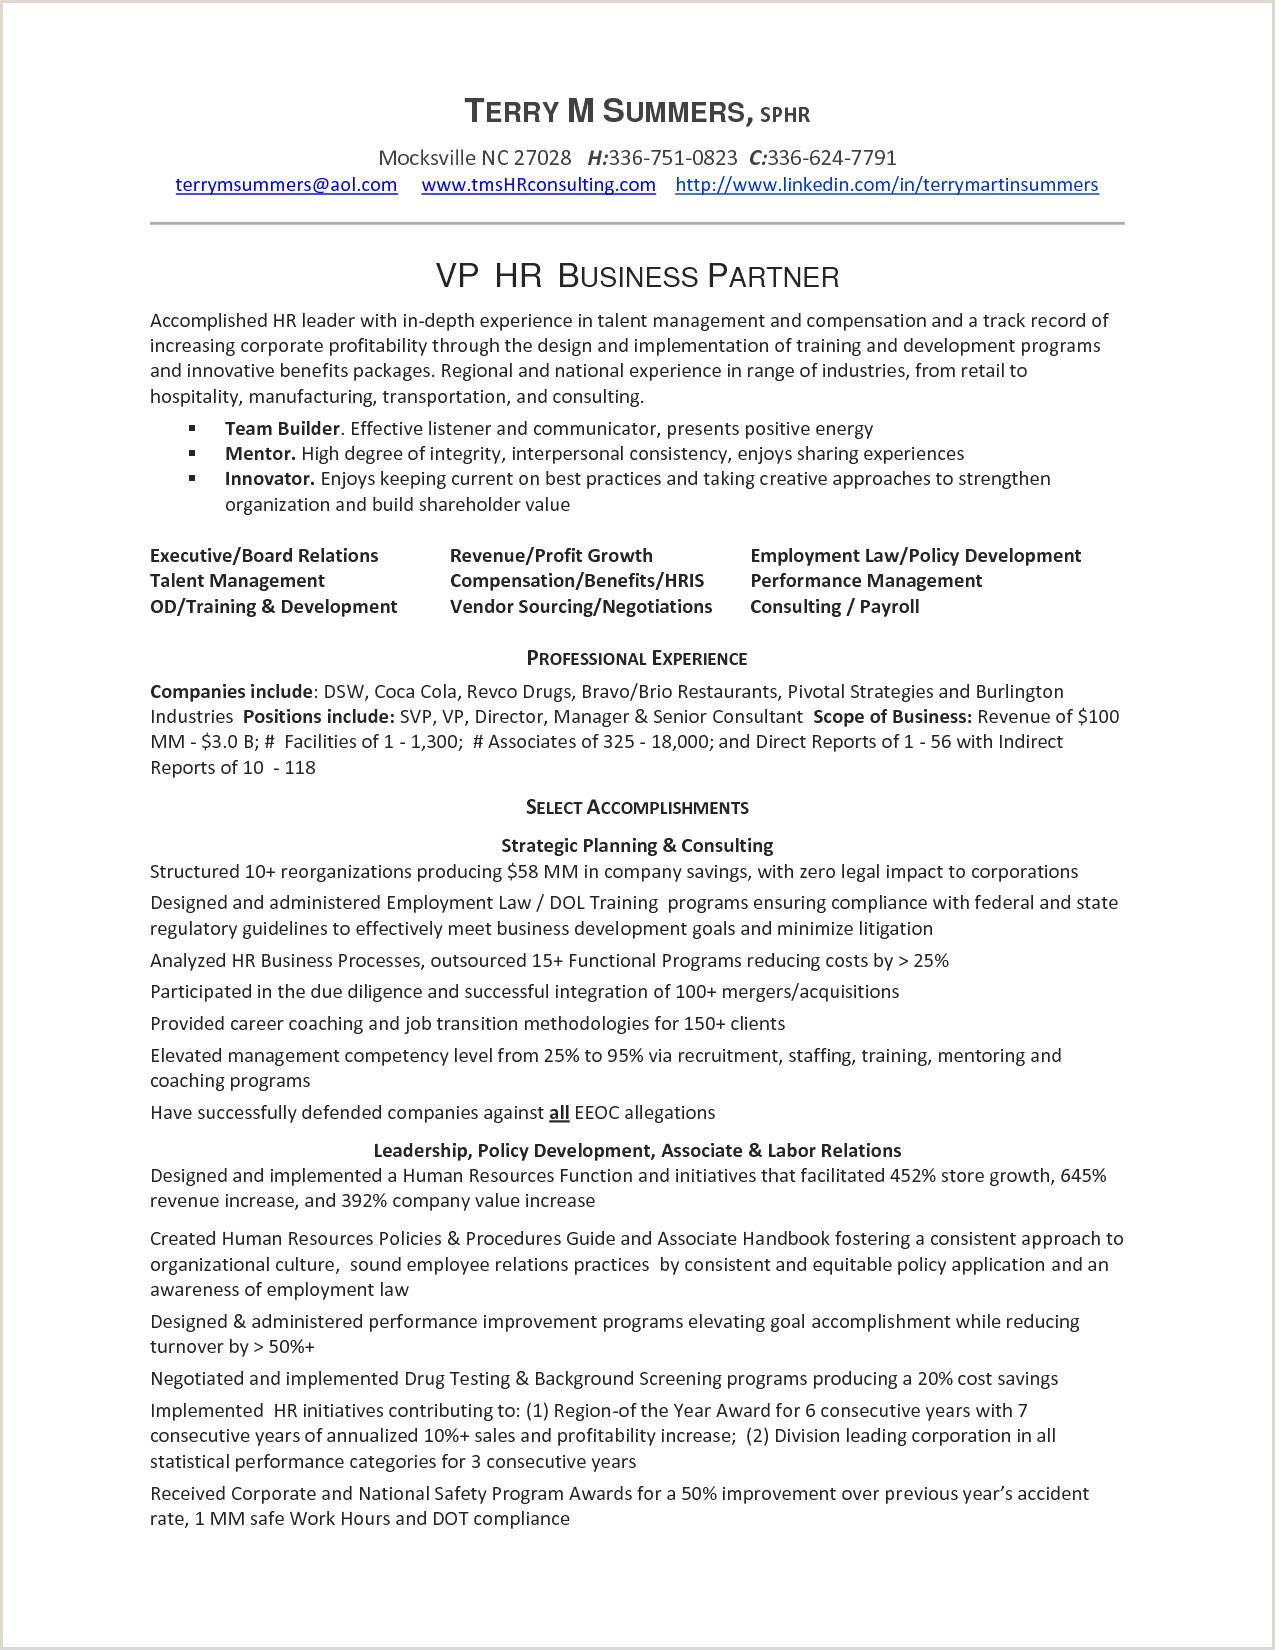 Fbi Resume Example Professional Beautiful Fbi Id Card